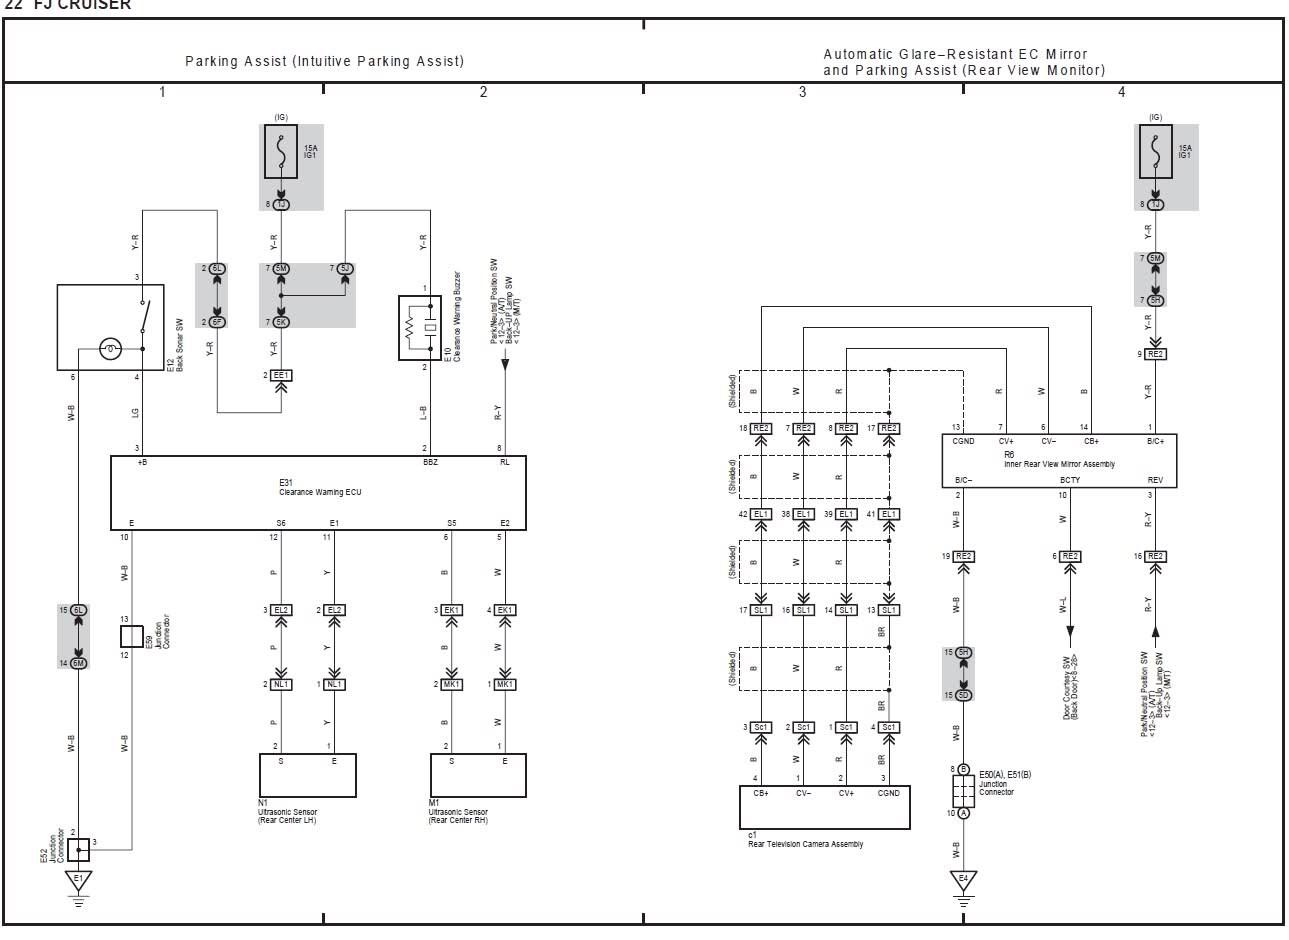 images?q=tbn:ANd9GcQh_l3eQ5xwiPy07kGEXjmjgmBKBRB7H2mRxCGhv1tFWg5c_mWT Toyota Radio Wiring Harness